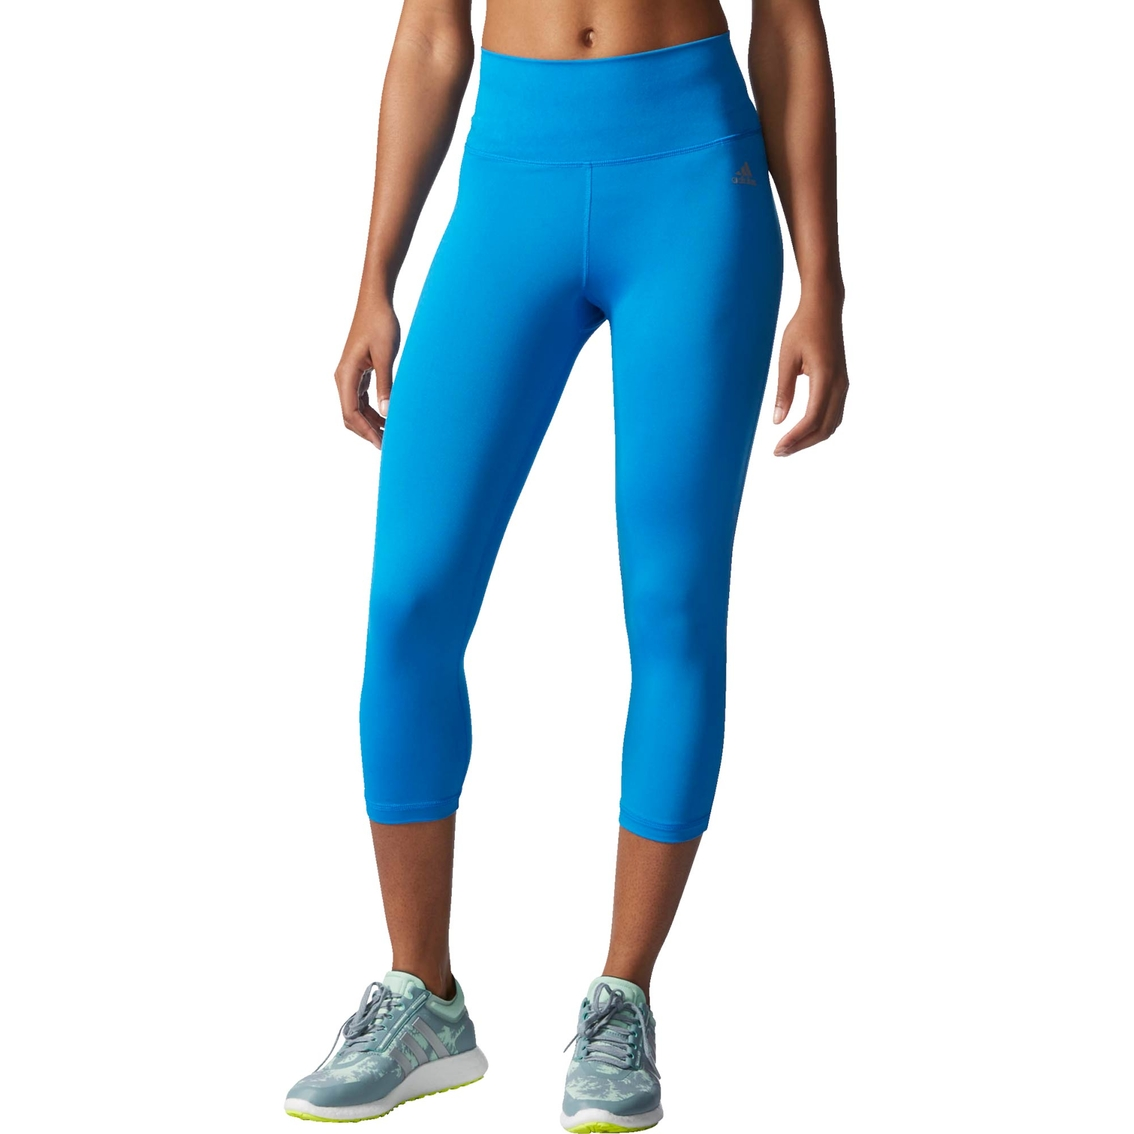 f5fcd65572ba7 Adidas Performer High Rise Three-quarter Tights | Pants & Capris ...